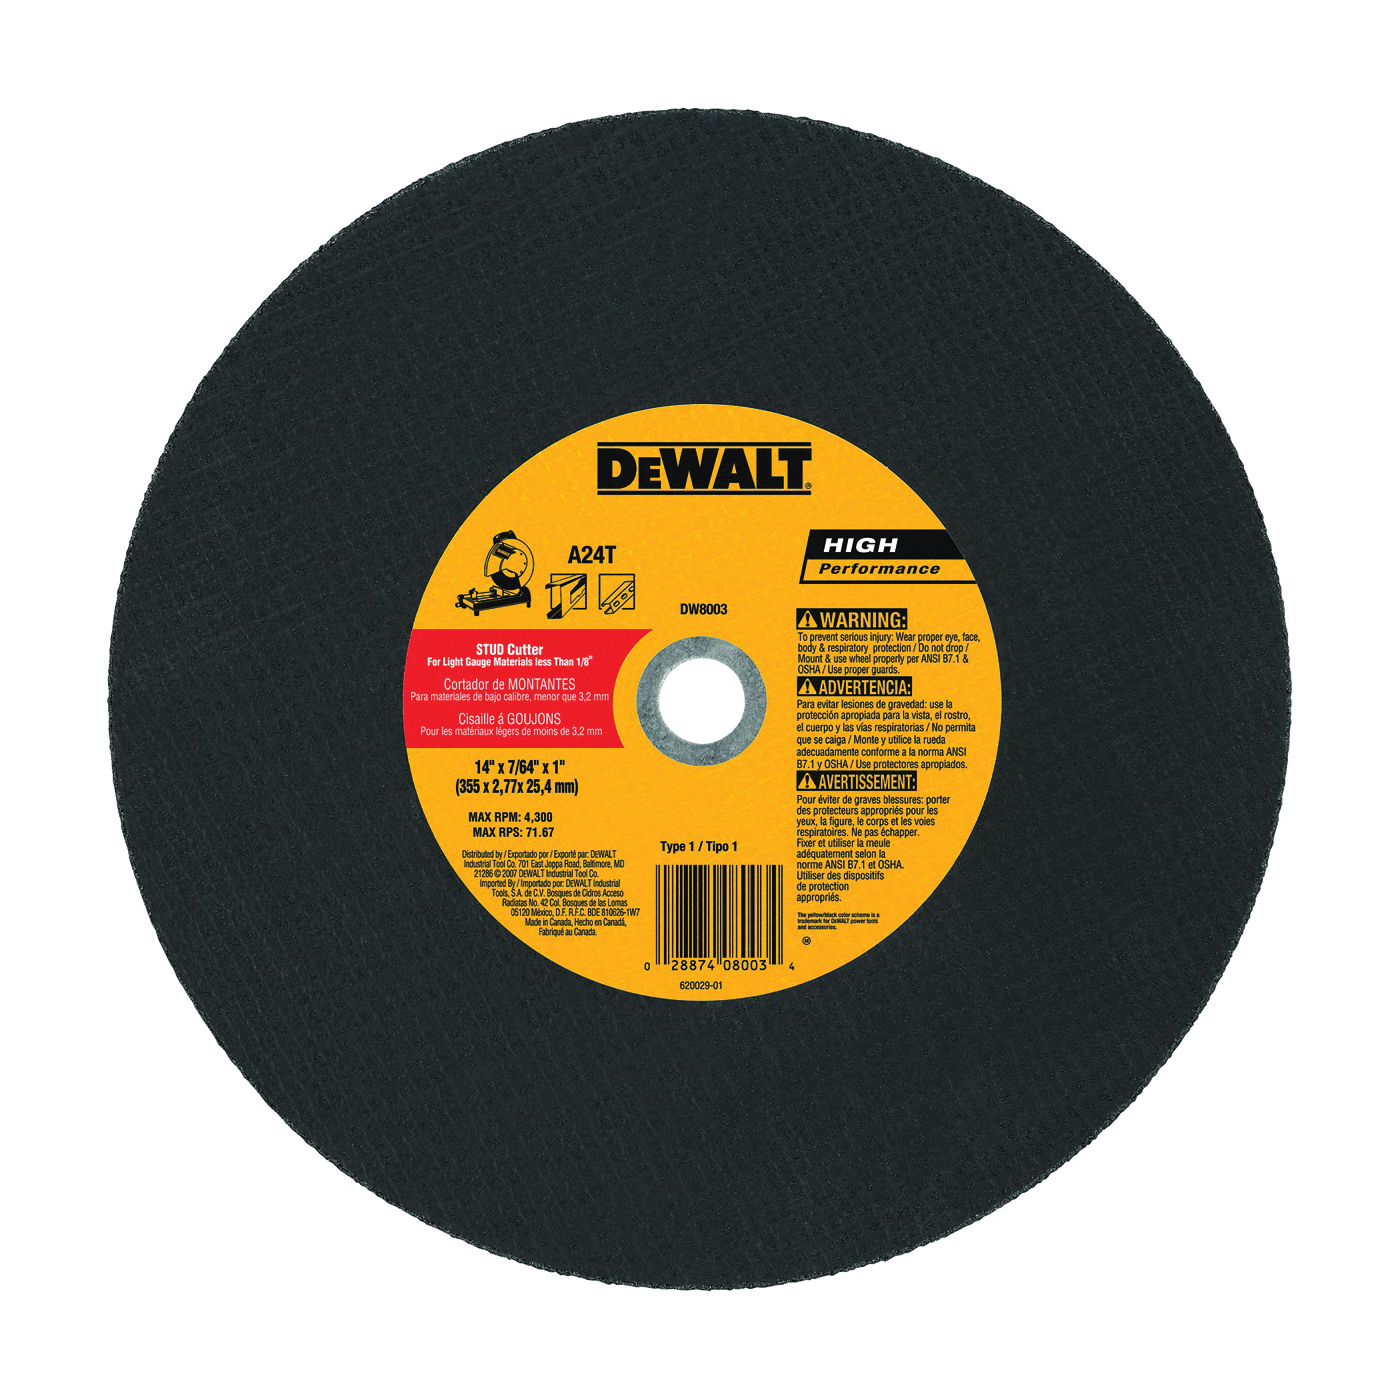 Picture of DeWALT DW8003 Cutting Wheel, 14 in Dia, 7/64 in Thick, 1 in Arbor, Coarse, Aluminum Oxide Abrasive